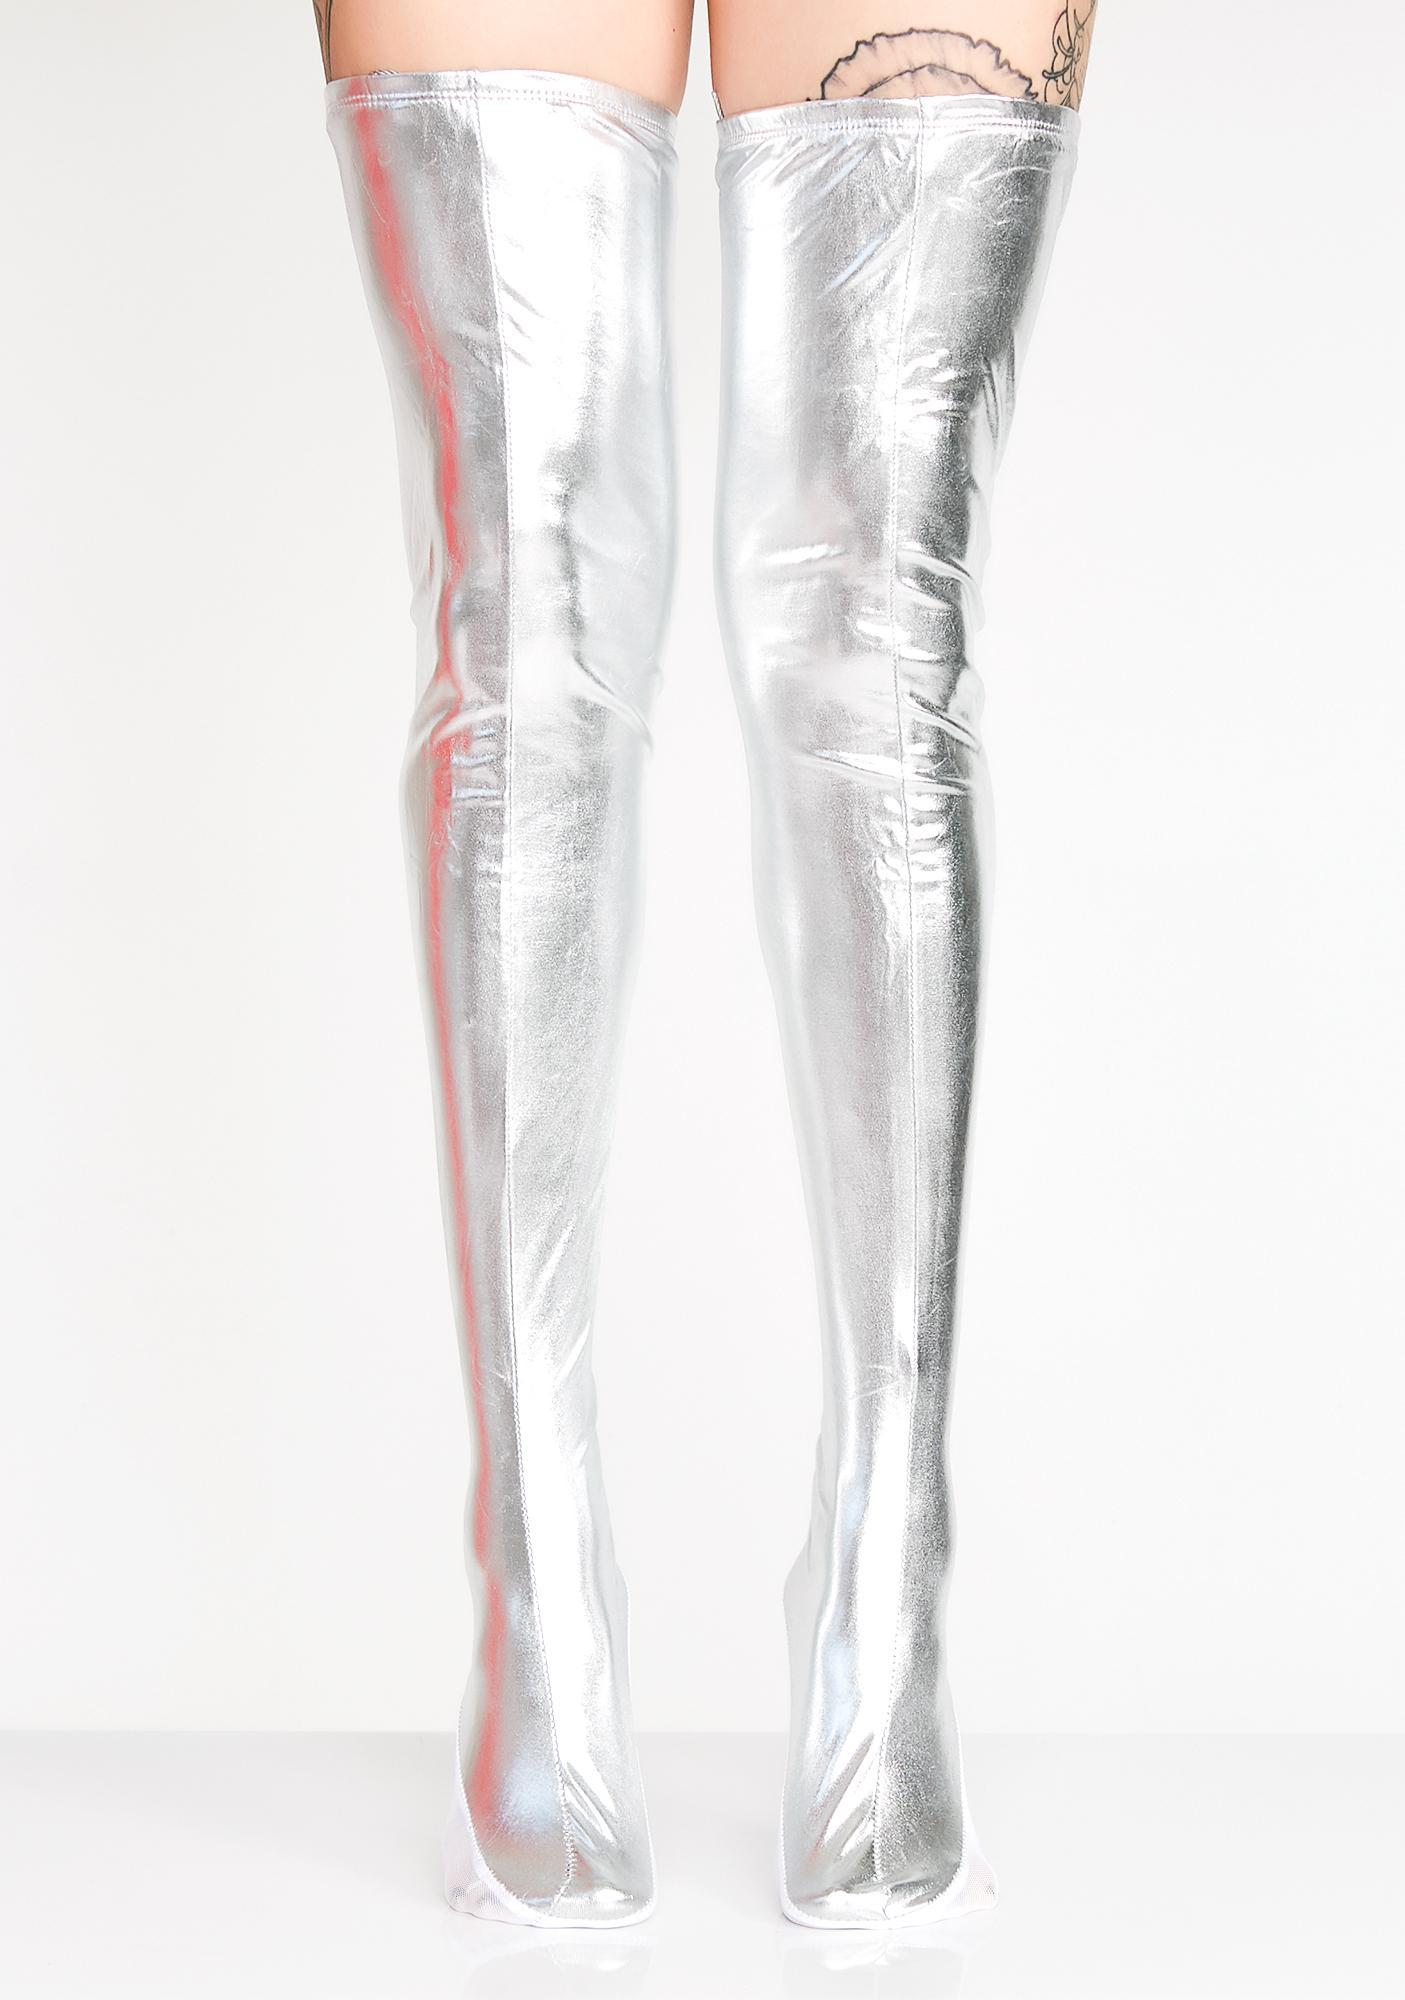 cb423ef1d38 Baddie Bot Lace-Up Thigh Highs